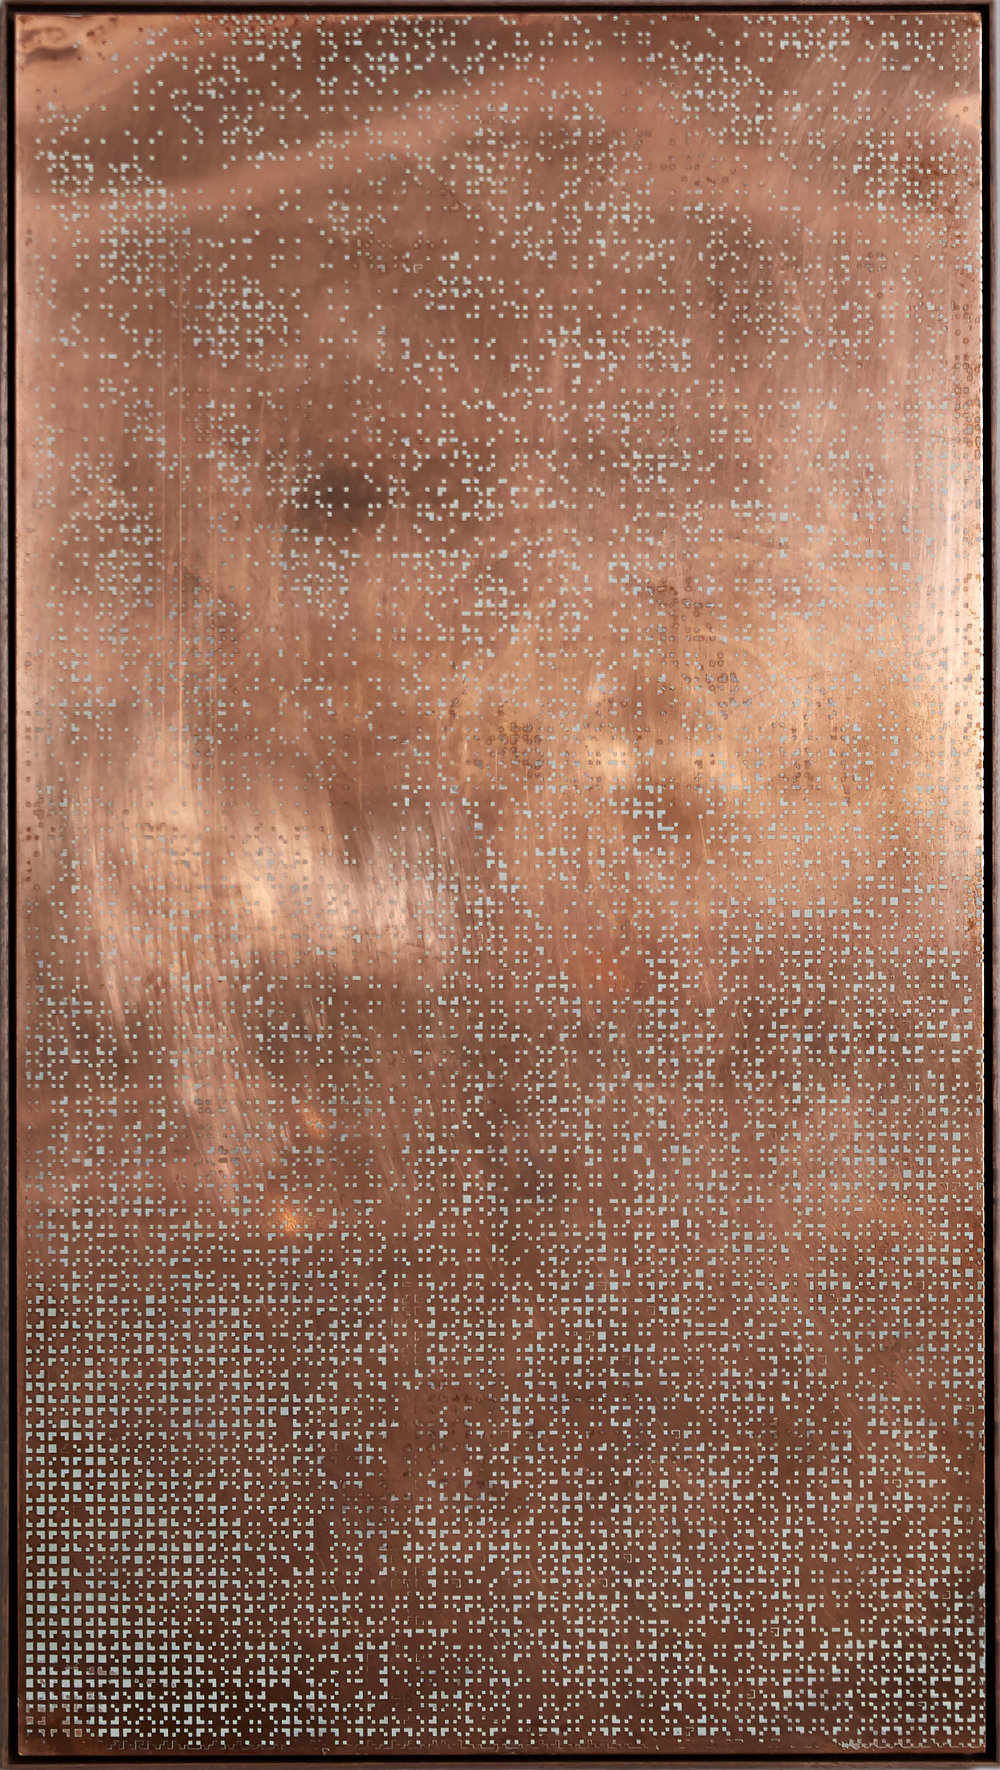 Hard Copy (Monolith)